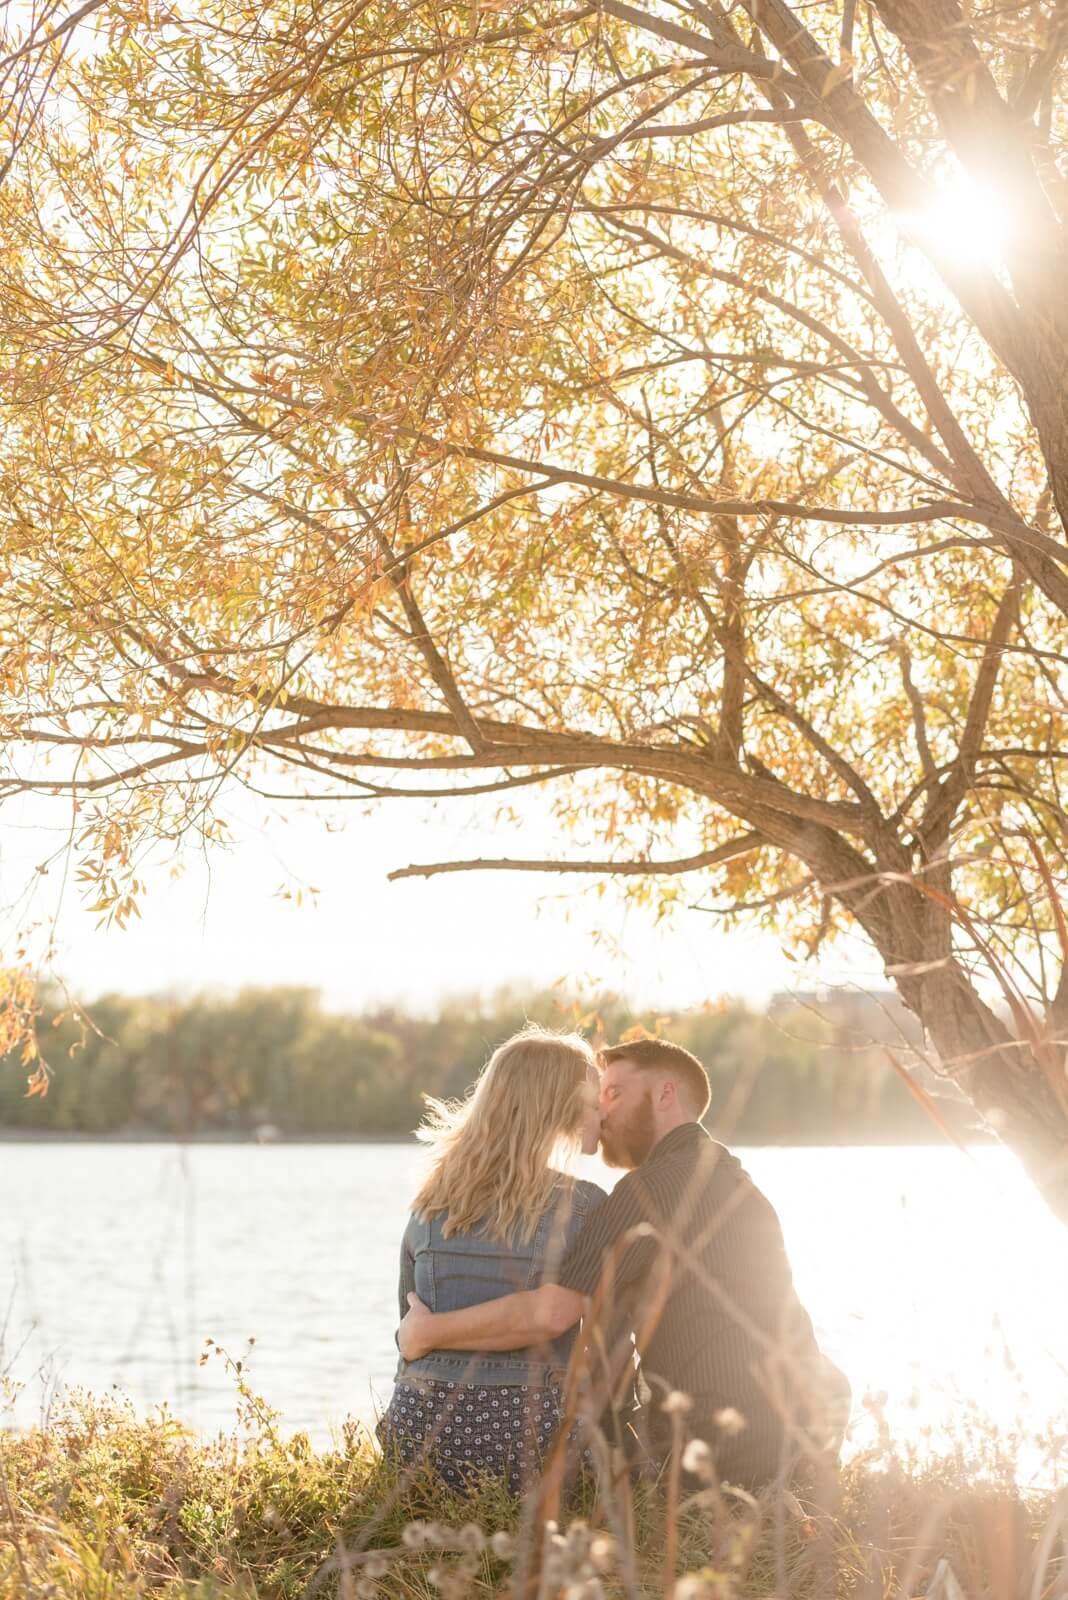 Regina Engagement Photography - Andy-Laura - Wascana Park Kiss